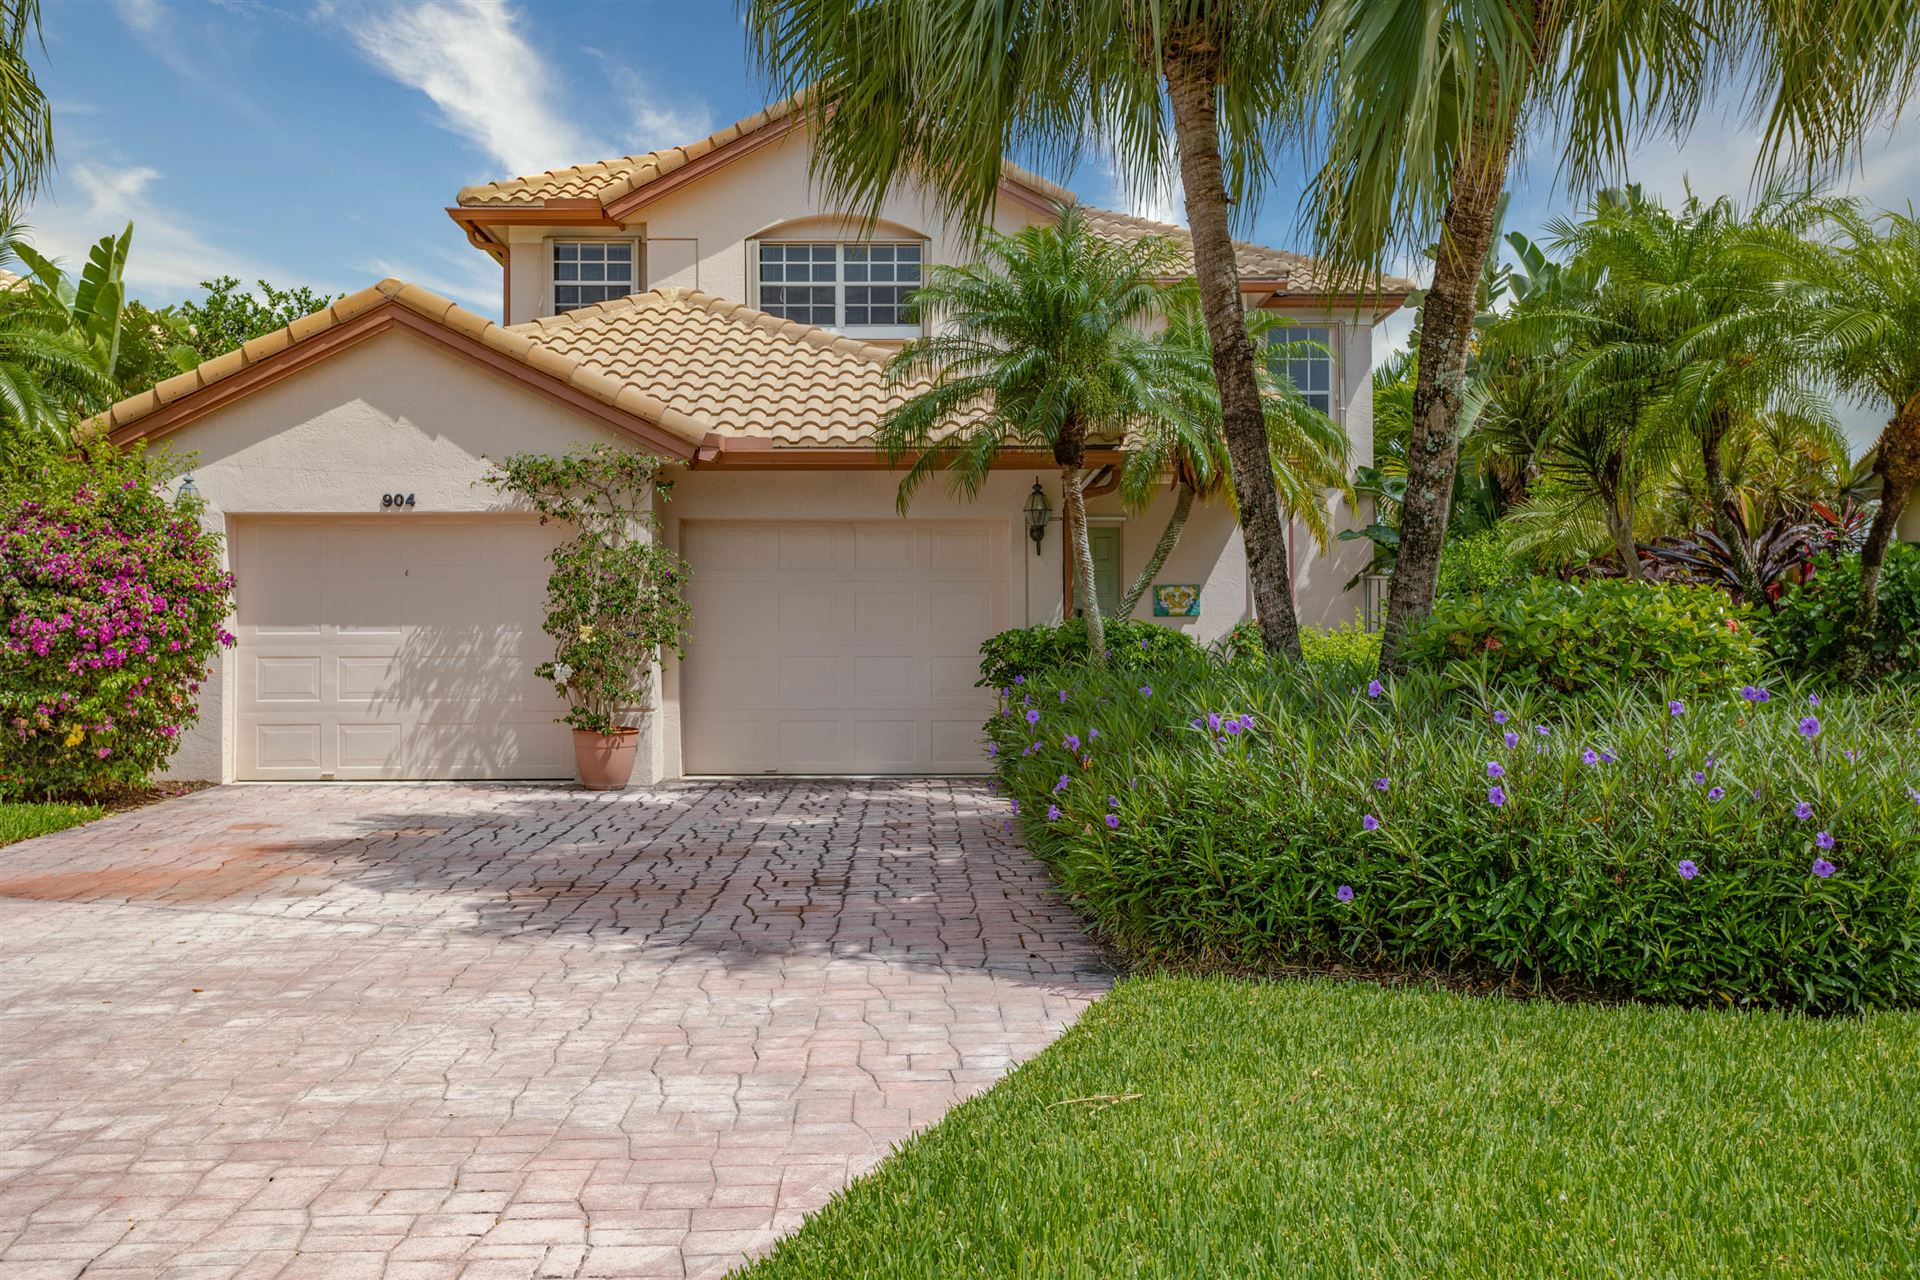 Photo of 904 Augusta Pointe Drive, Palm Beach Gardens, FL 33418 (MLS # RX-10721794)